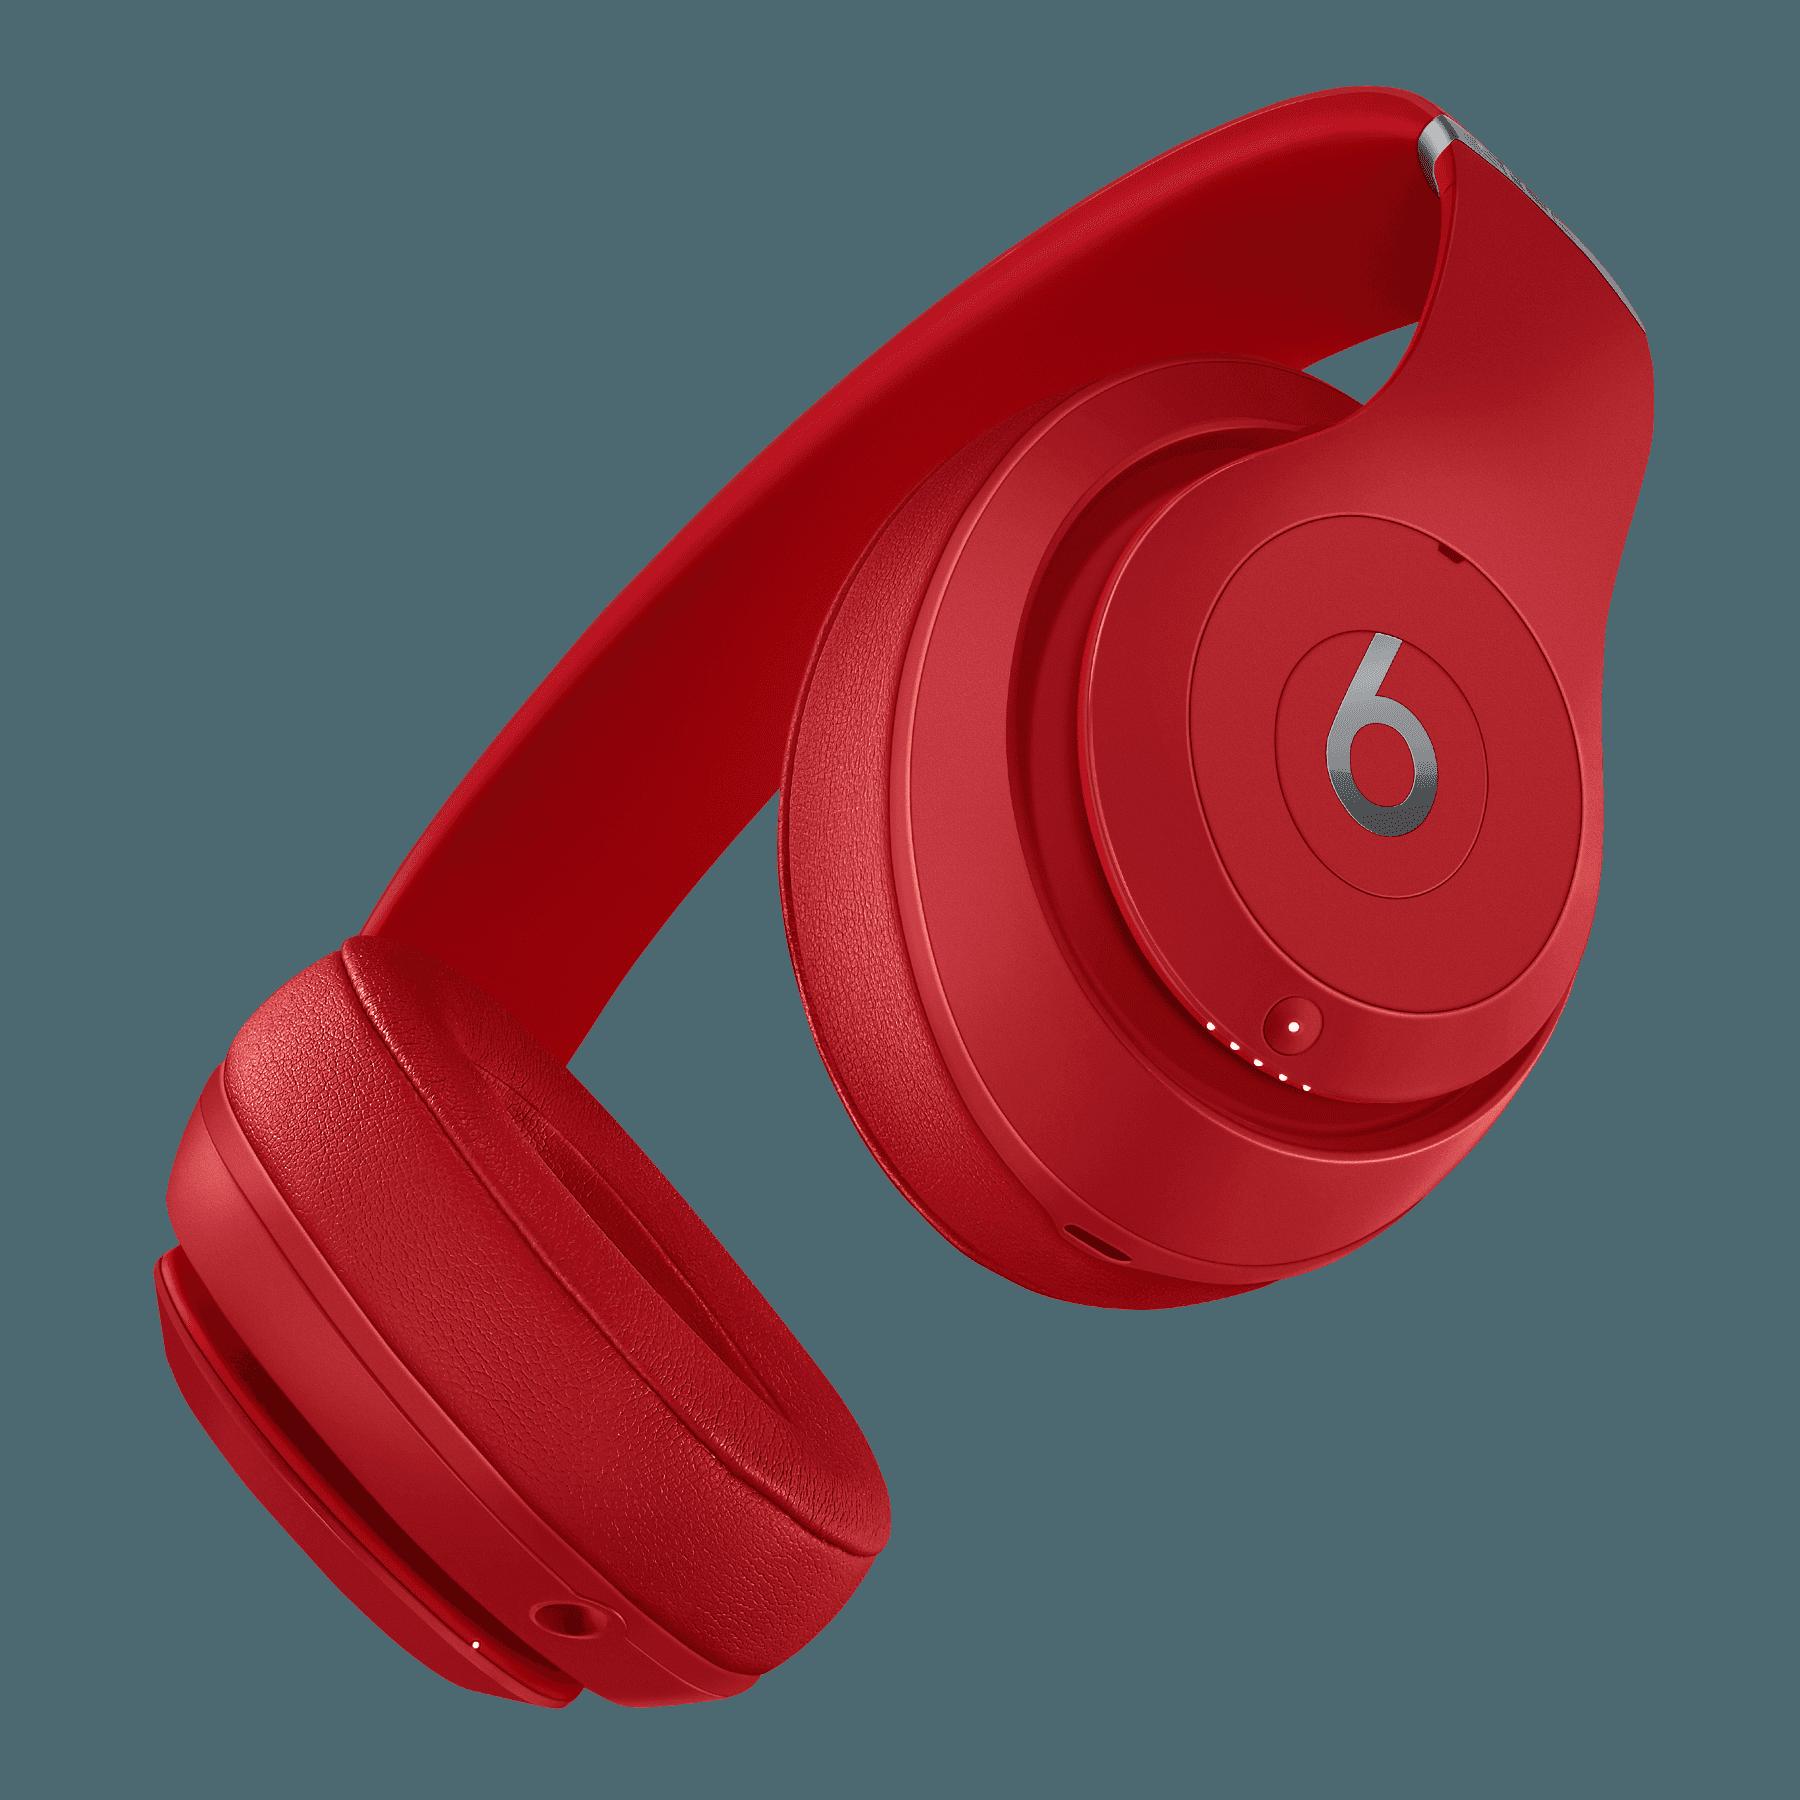 Beats Studio3 Wireless Beats By Dre Beats Headphones Wireless Wireless Beats Headphones